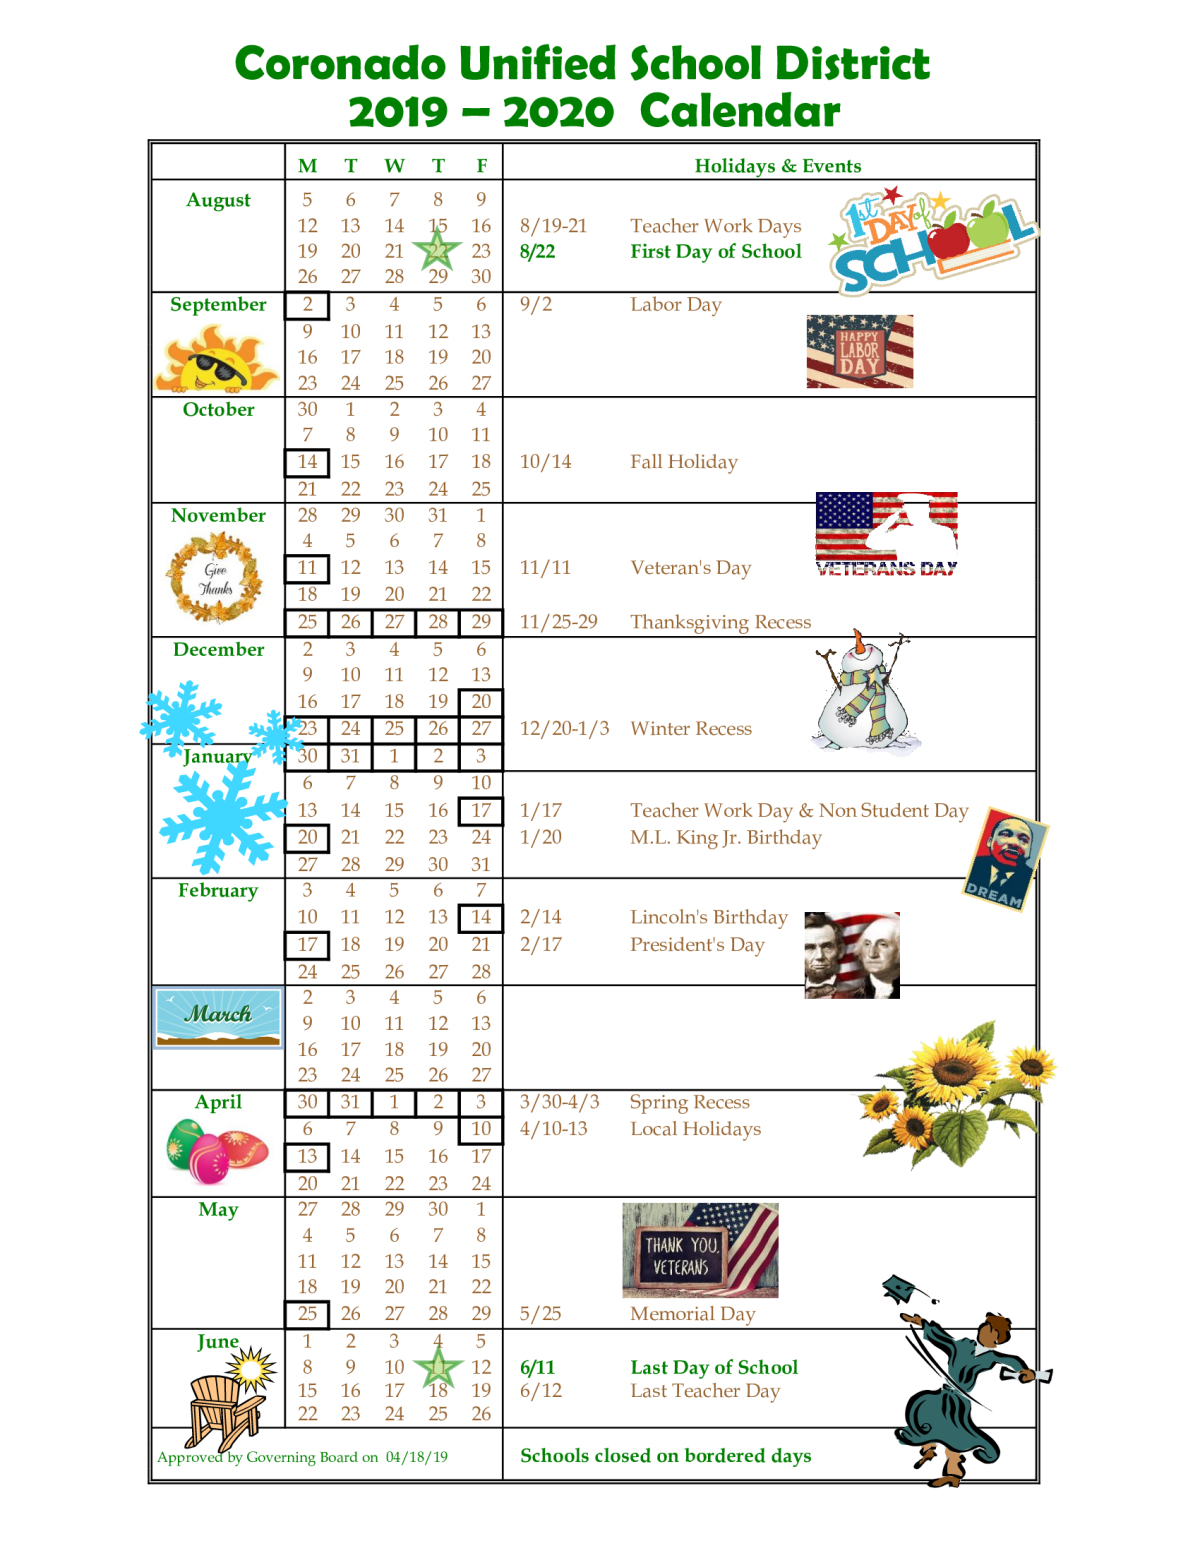 About / Academic Calendar & Bell Schedule | Silver Strand Regarding San Diego Unified School District Calendar